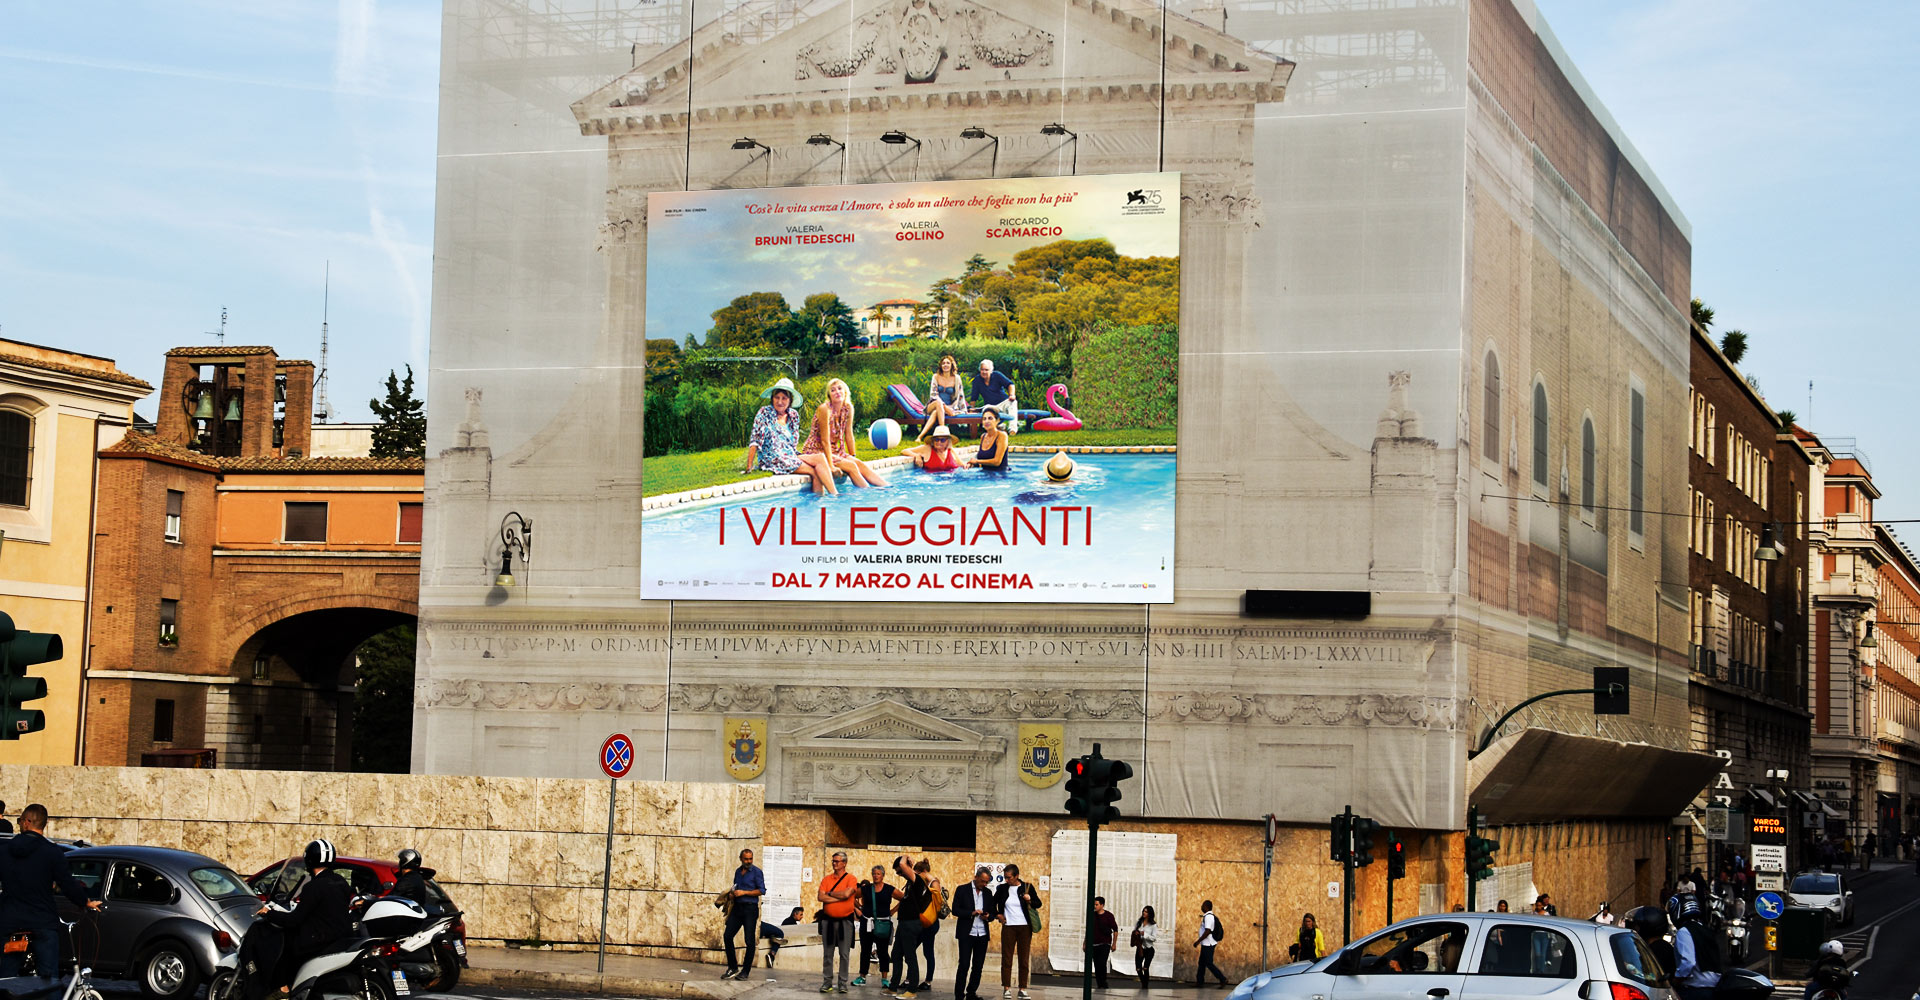 Villeggianti_Behance_065